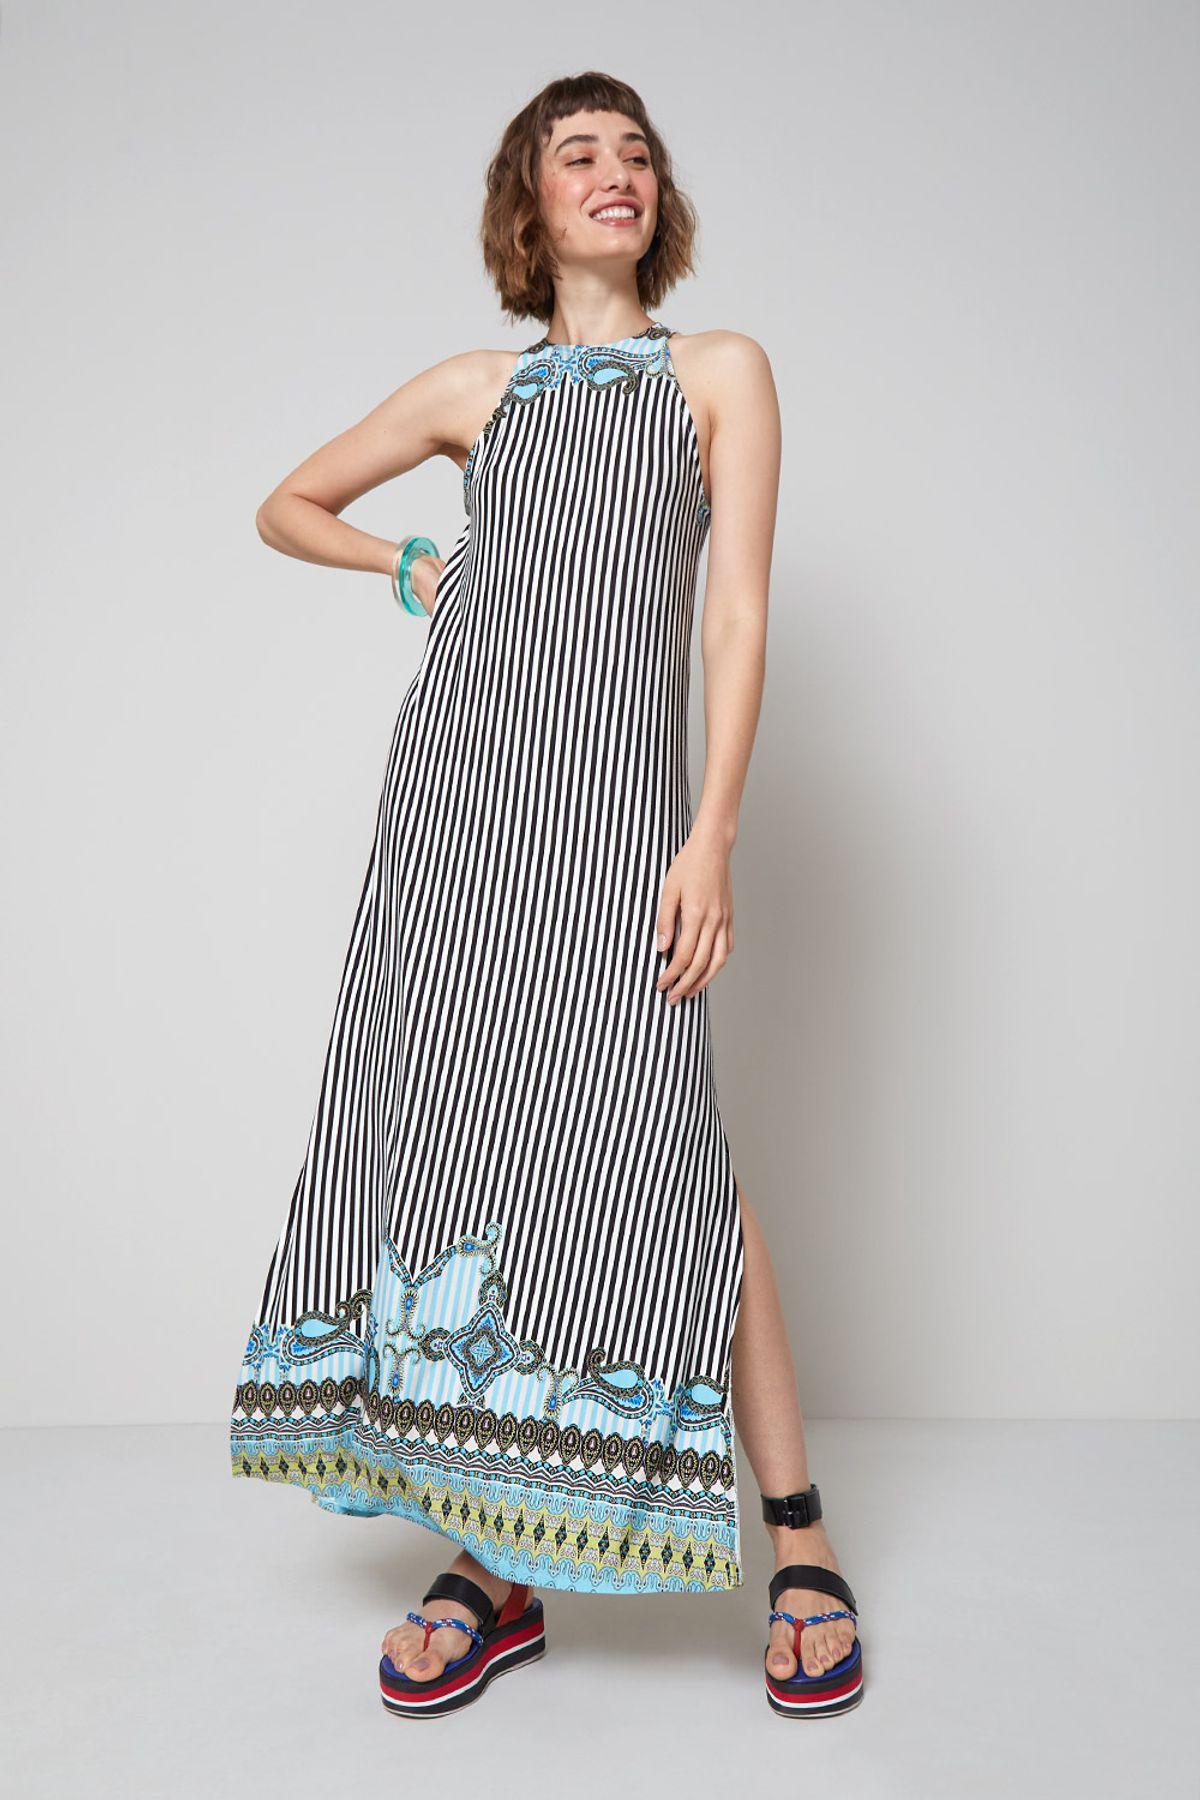 vestido estampado com fenda lateral